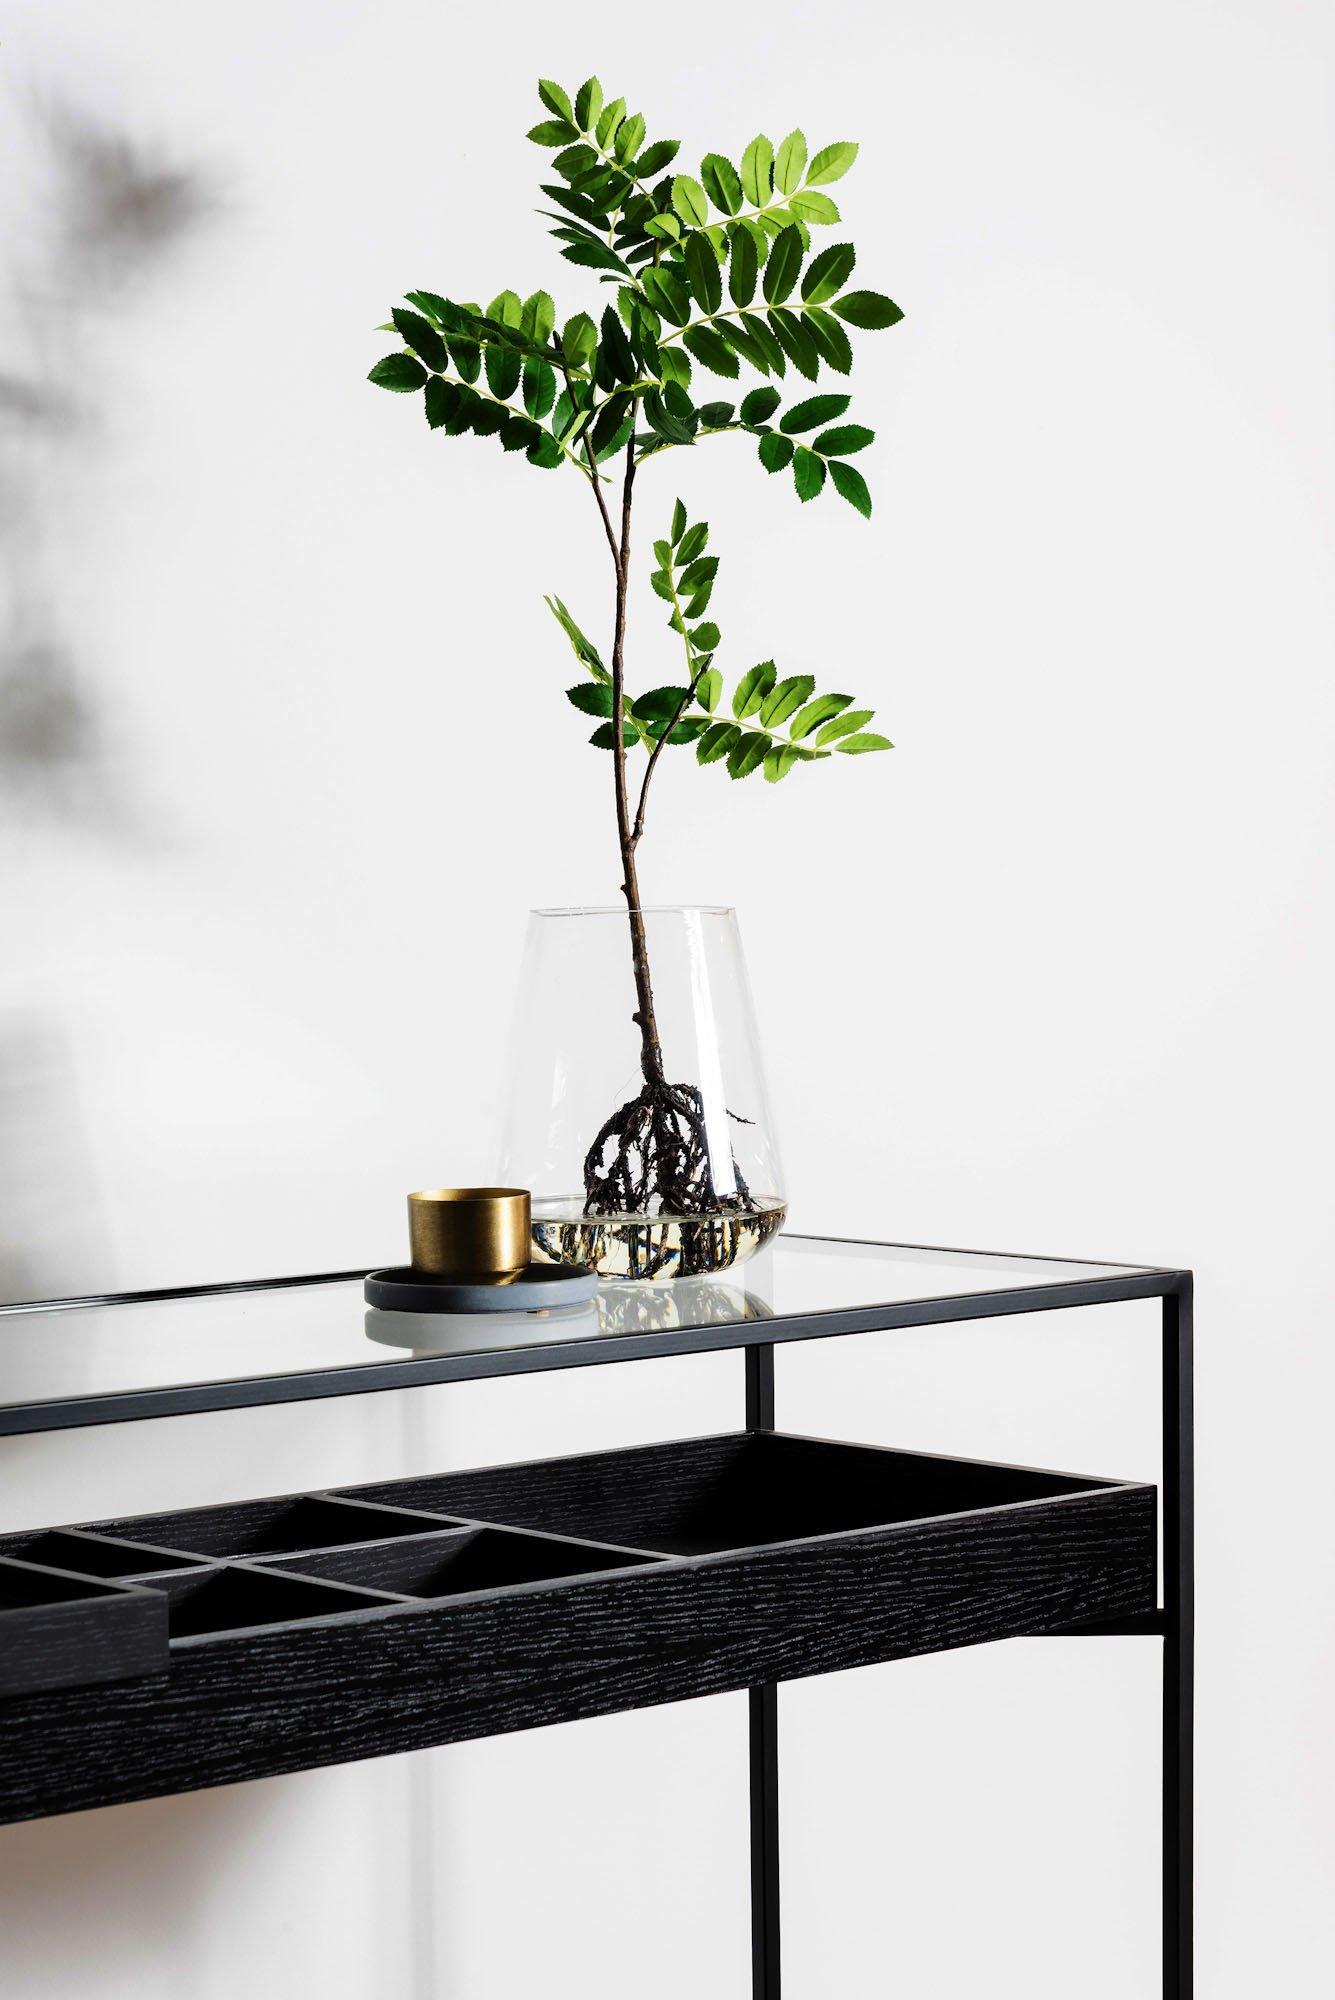 black slimline console with green plants in glass vase botanical interior design